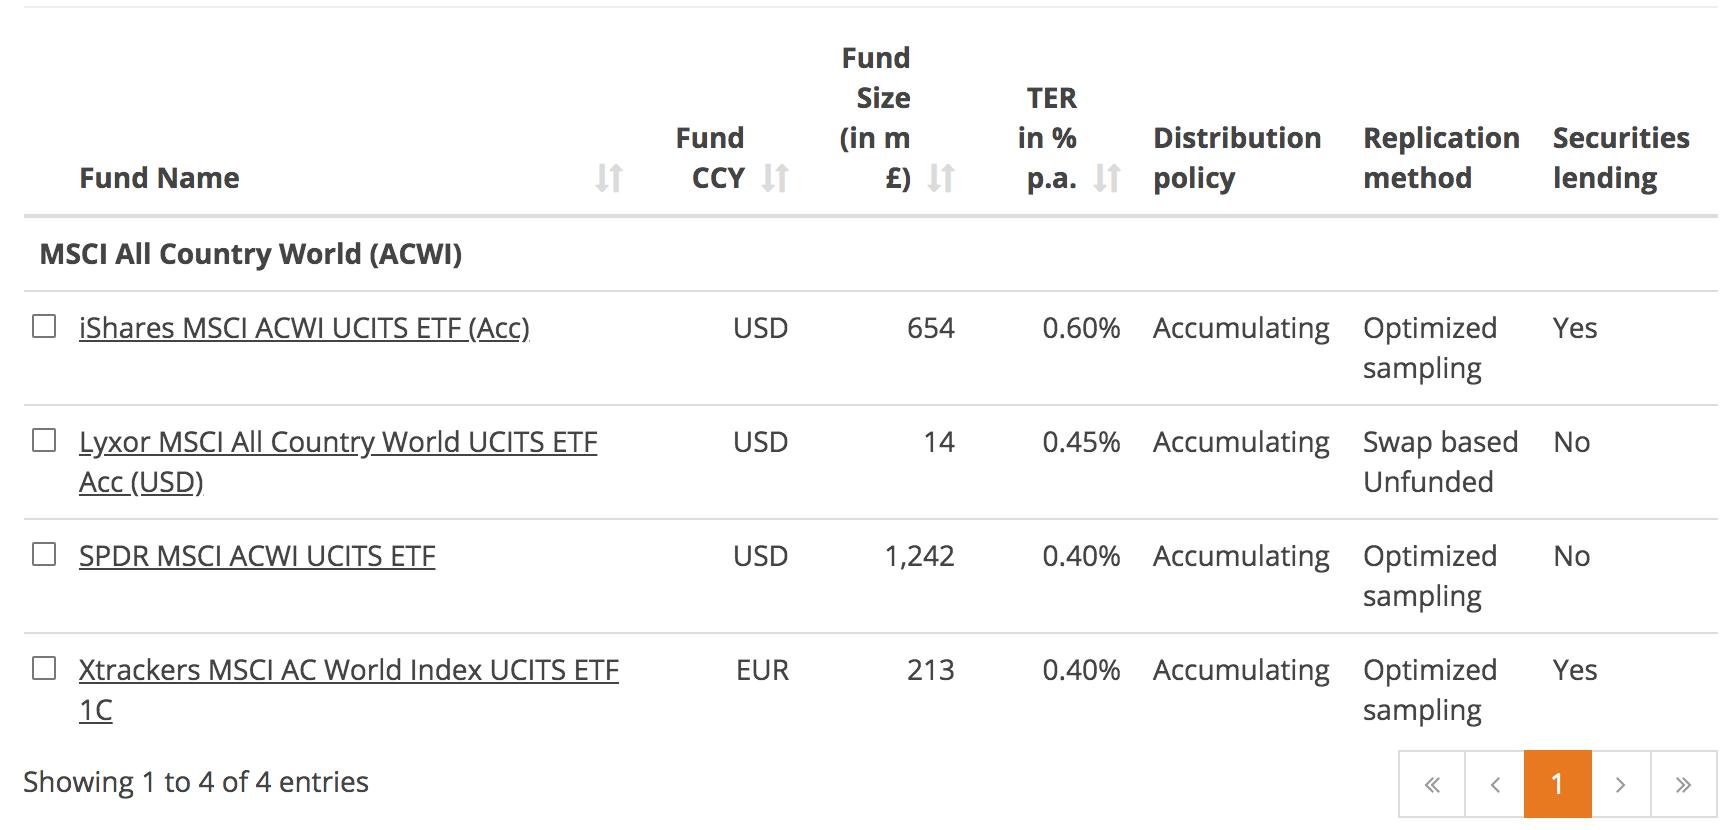 Screenshot taken from https://www.justetf.com/uk/find-etf.html?groupField=index&index=MSCI%2BAll%2BCountry%2BWorld%2B%2528ACWI%2529